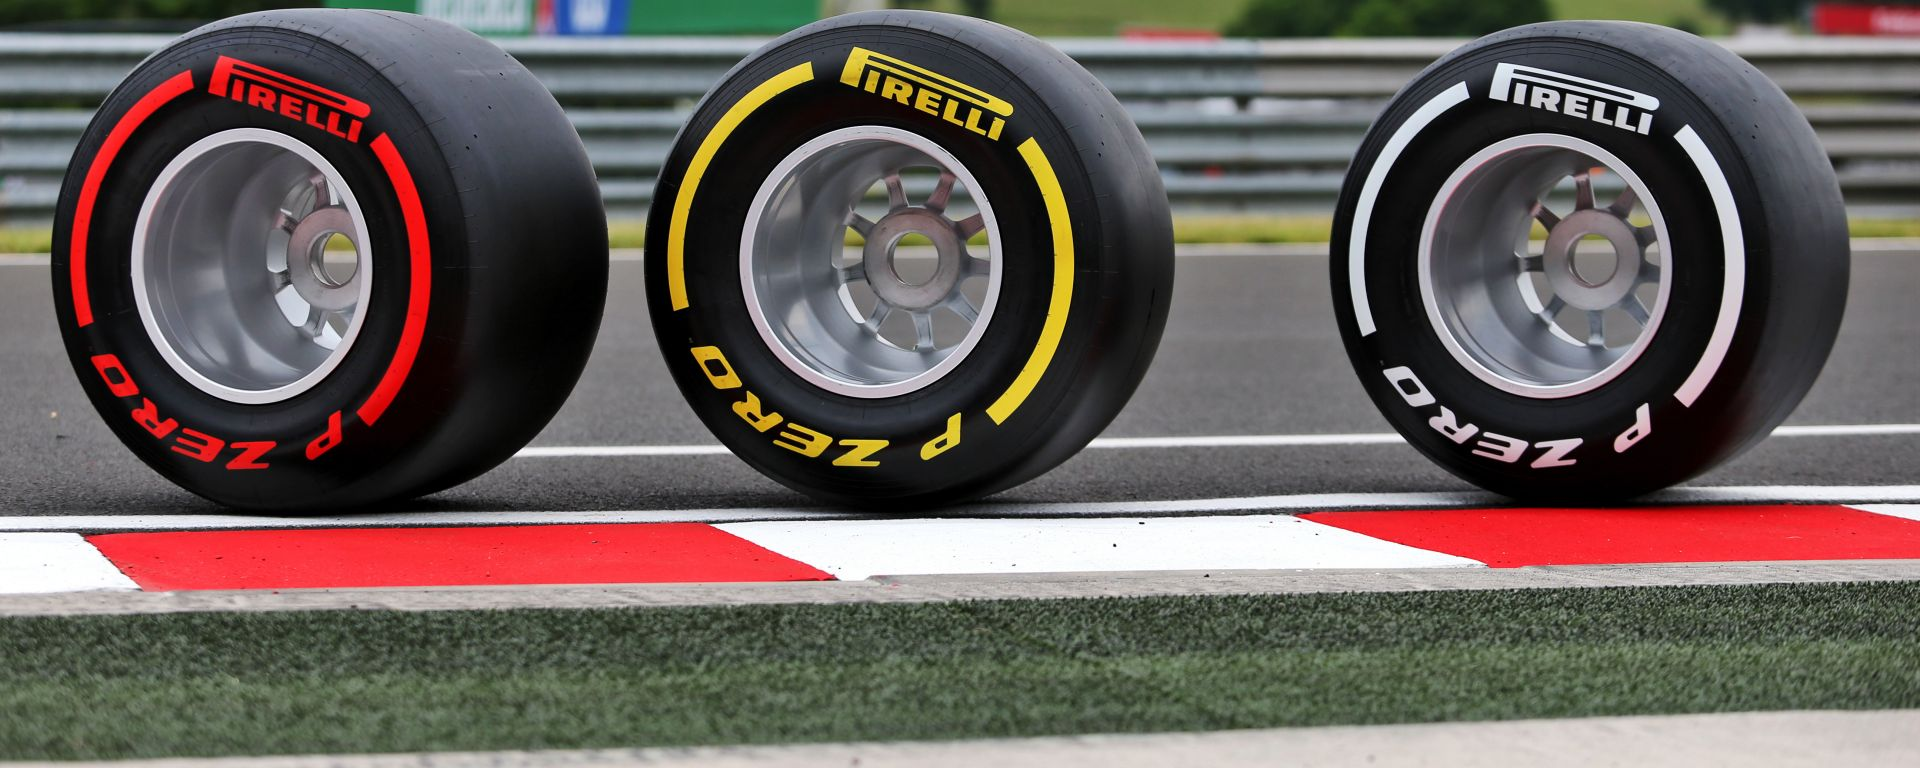 F1 GP Ungheria 2020, Budapest: le gomme Pirelli P-Zero Soft, Medium e Hard